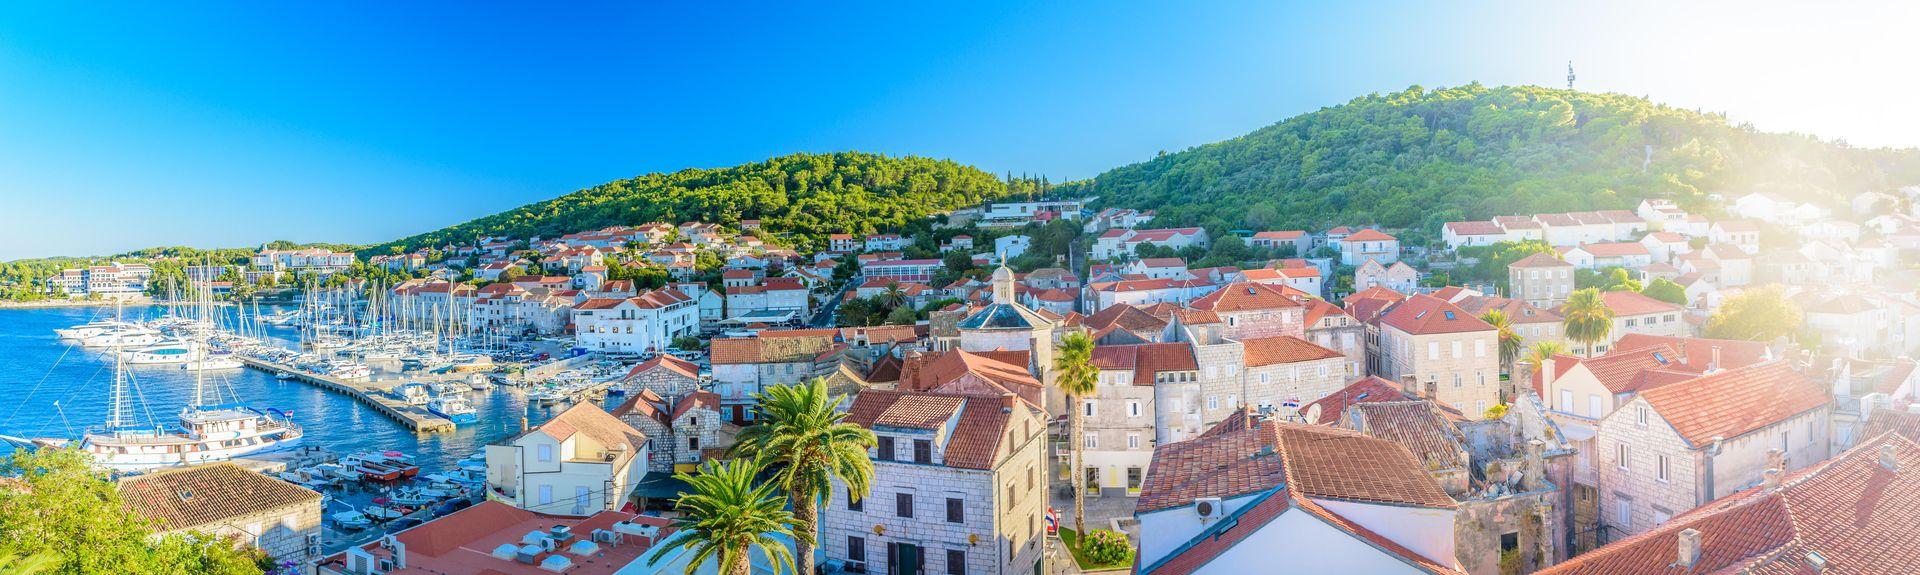 Korčula Island, Croatia